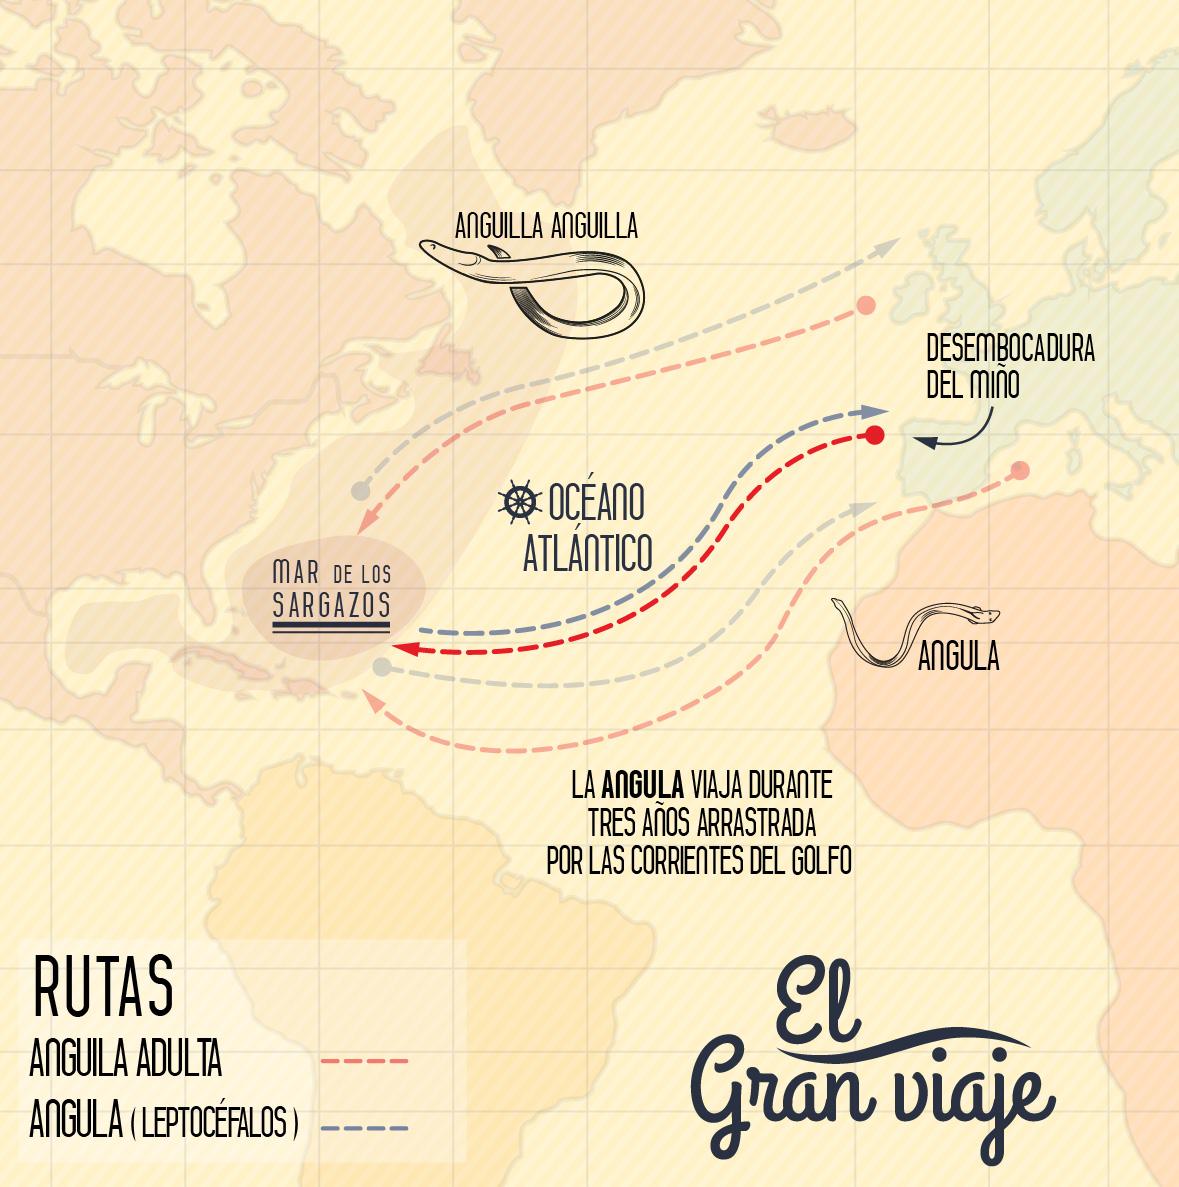 infografia mapa-ruta migratoria angulas-rio mino-01